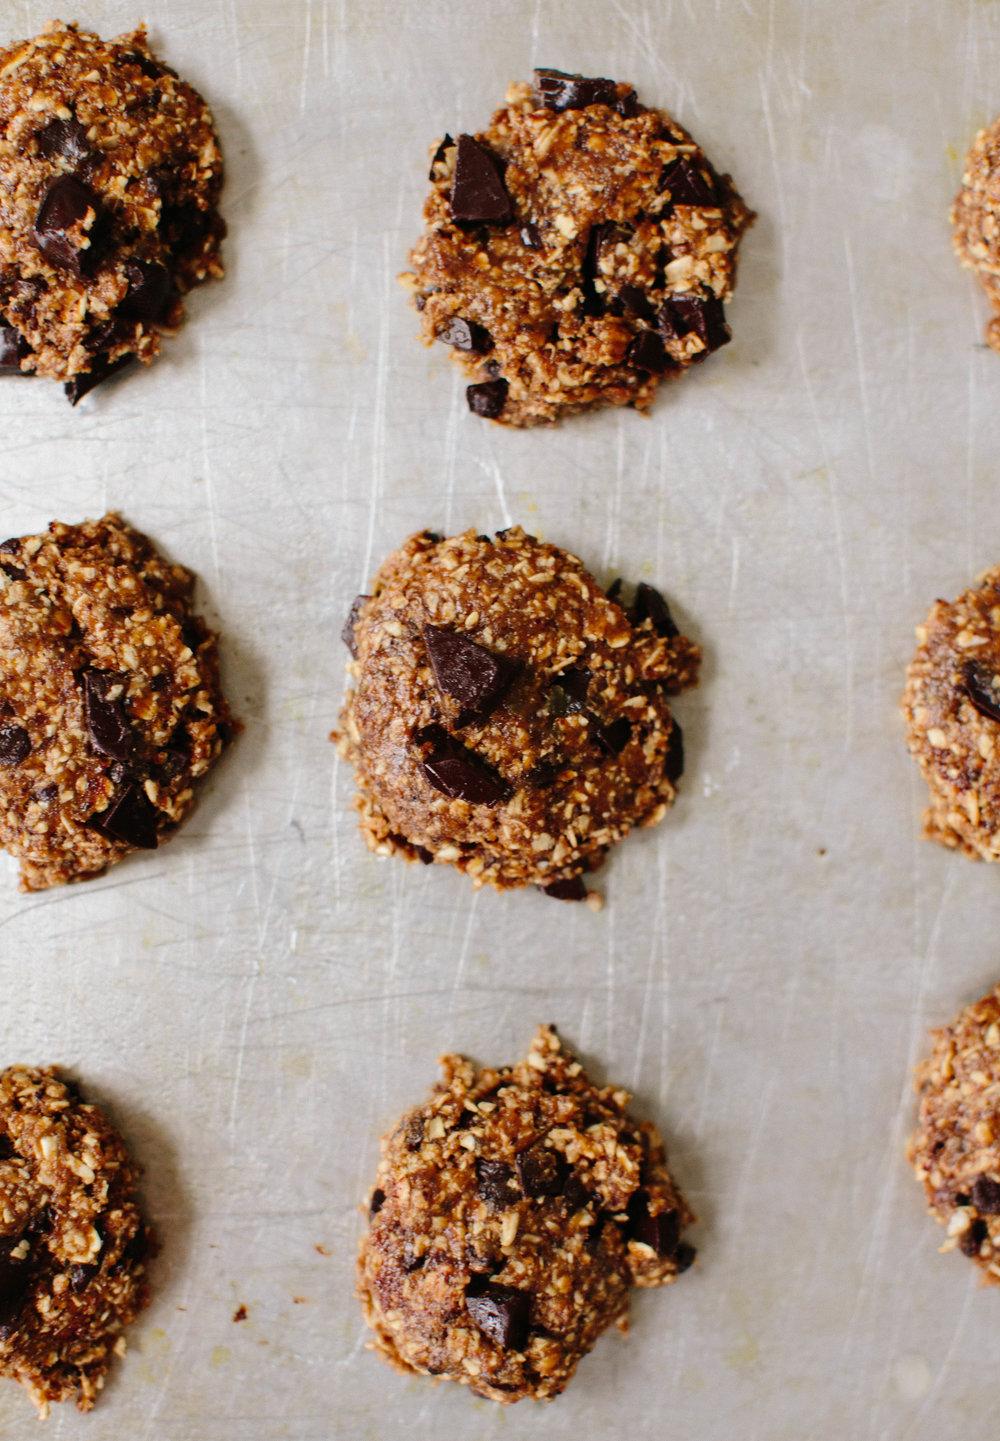 jennahazelphotography-oatmeal-ginger-chocoalte-chip-cookies-6706.jpg